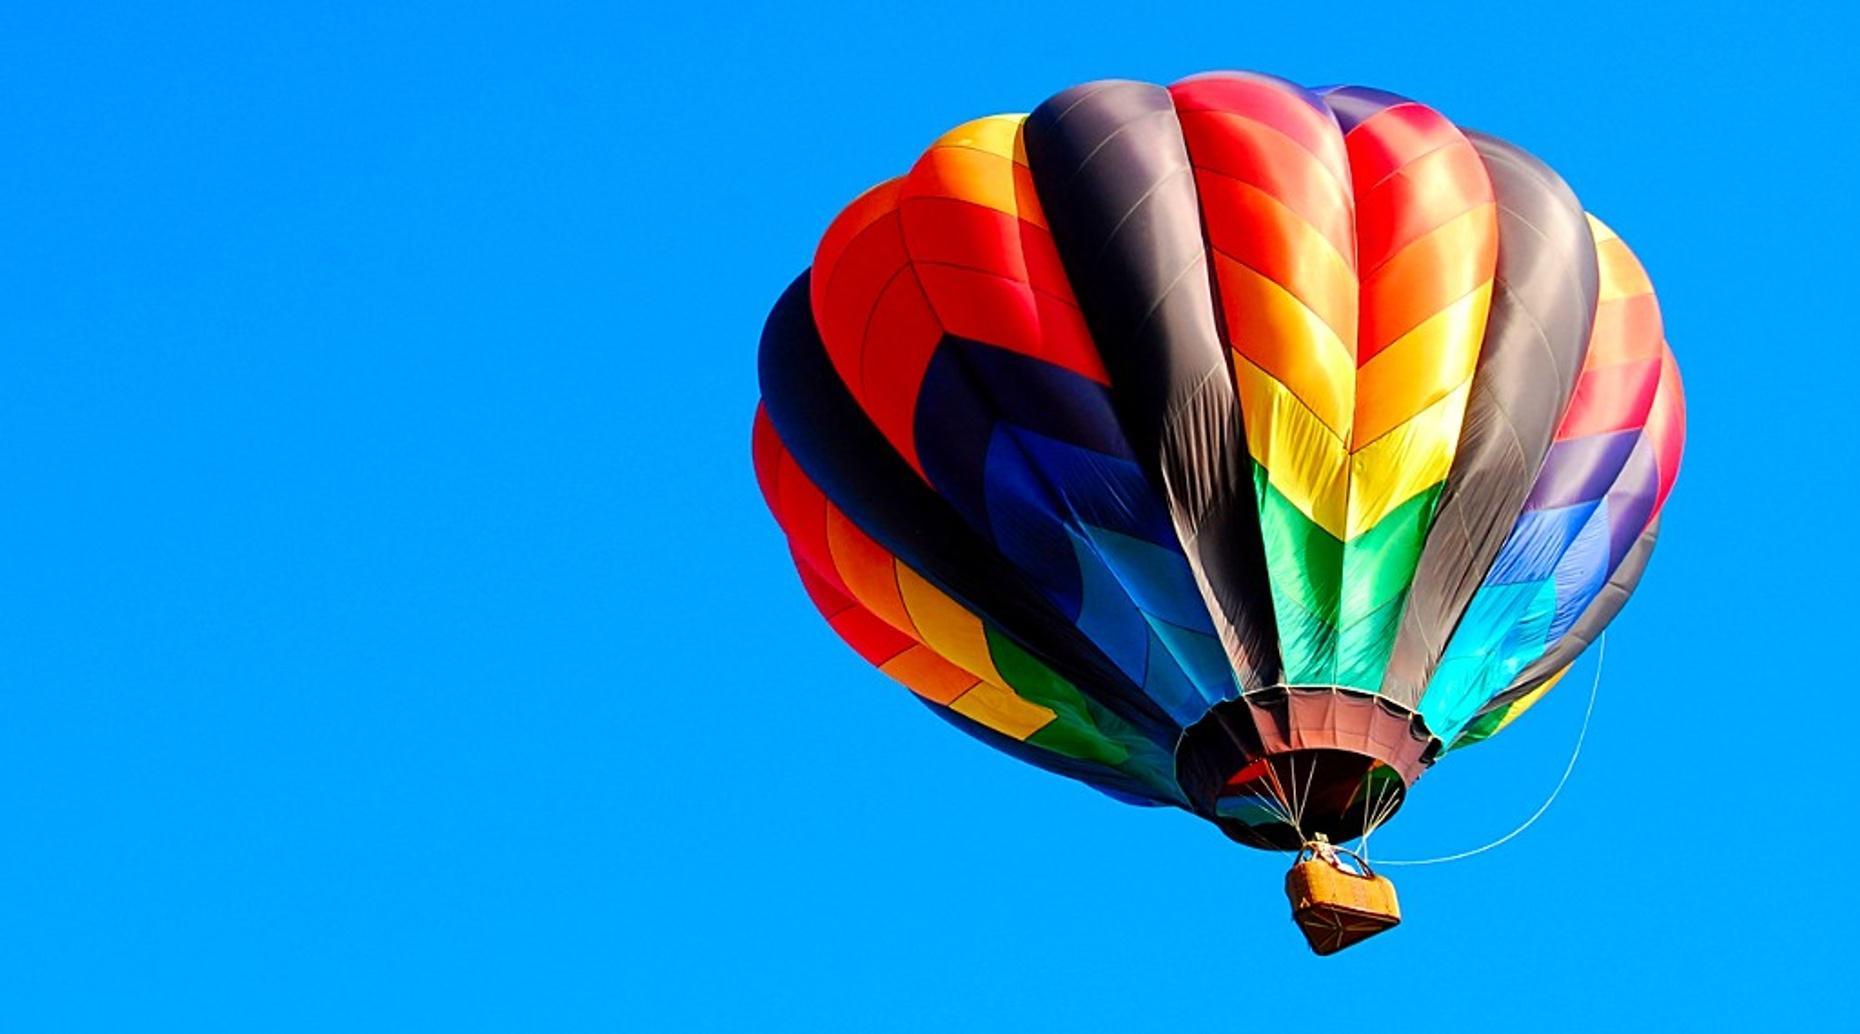 Hot Air Balloon Tour in Mexico City